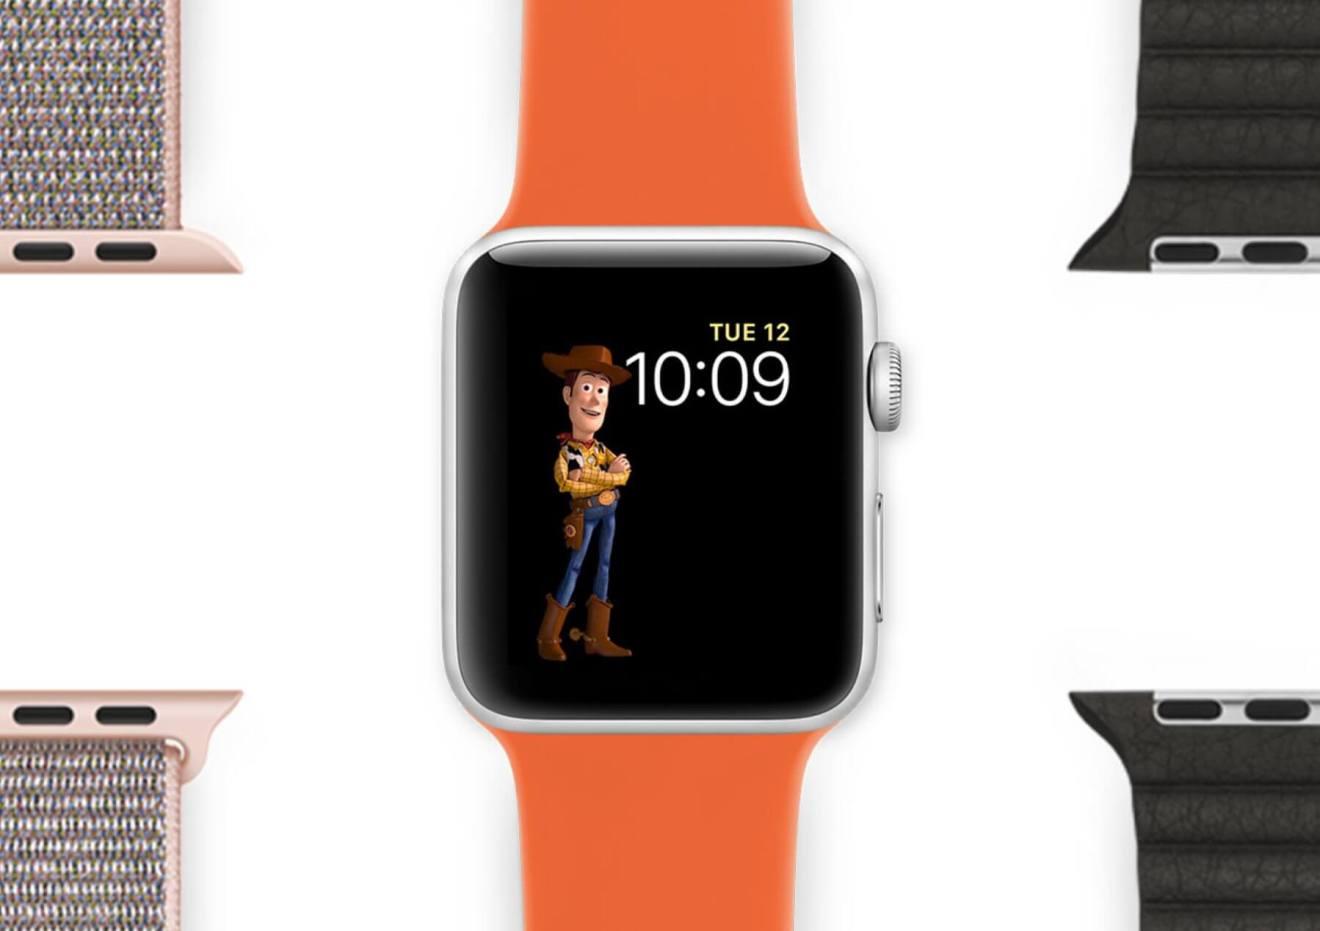 4C883AD1 D874 4519 B1FC C479B09380F2 - Vale a pena comprar um Apple Watch em 2018?